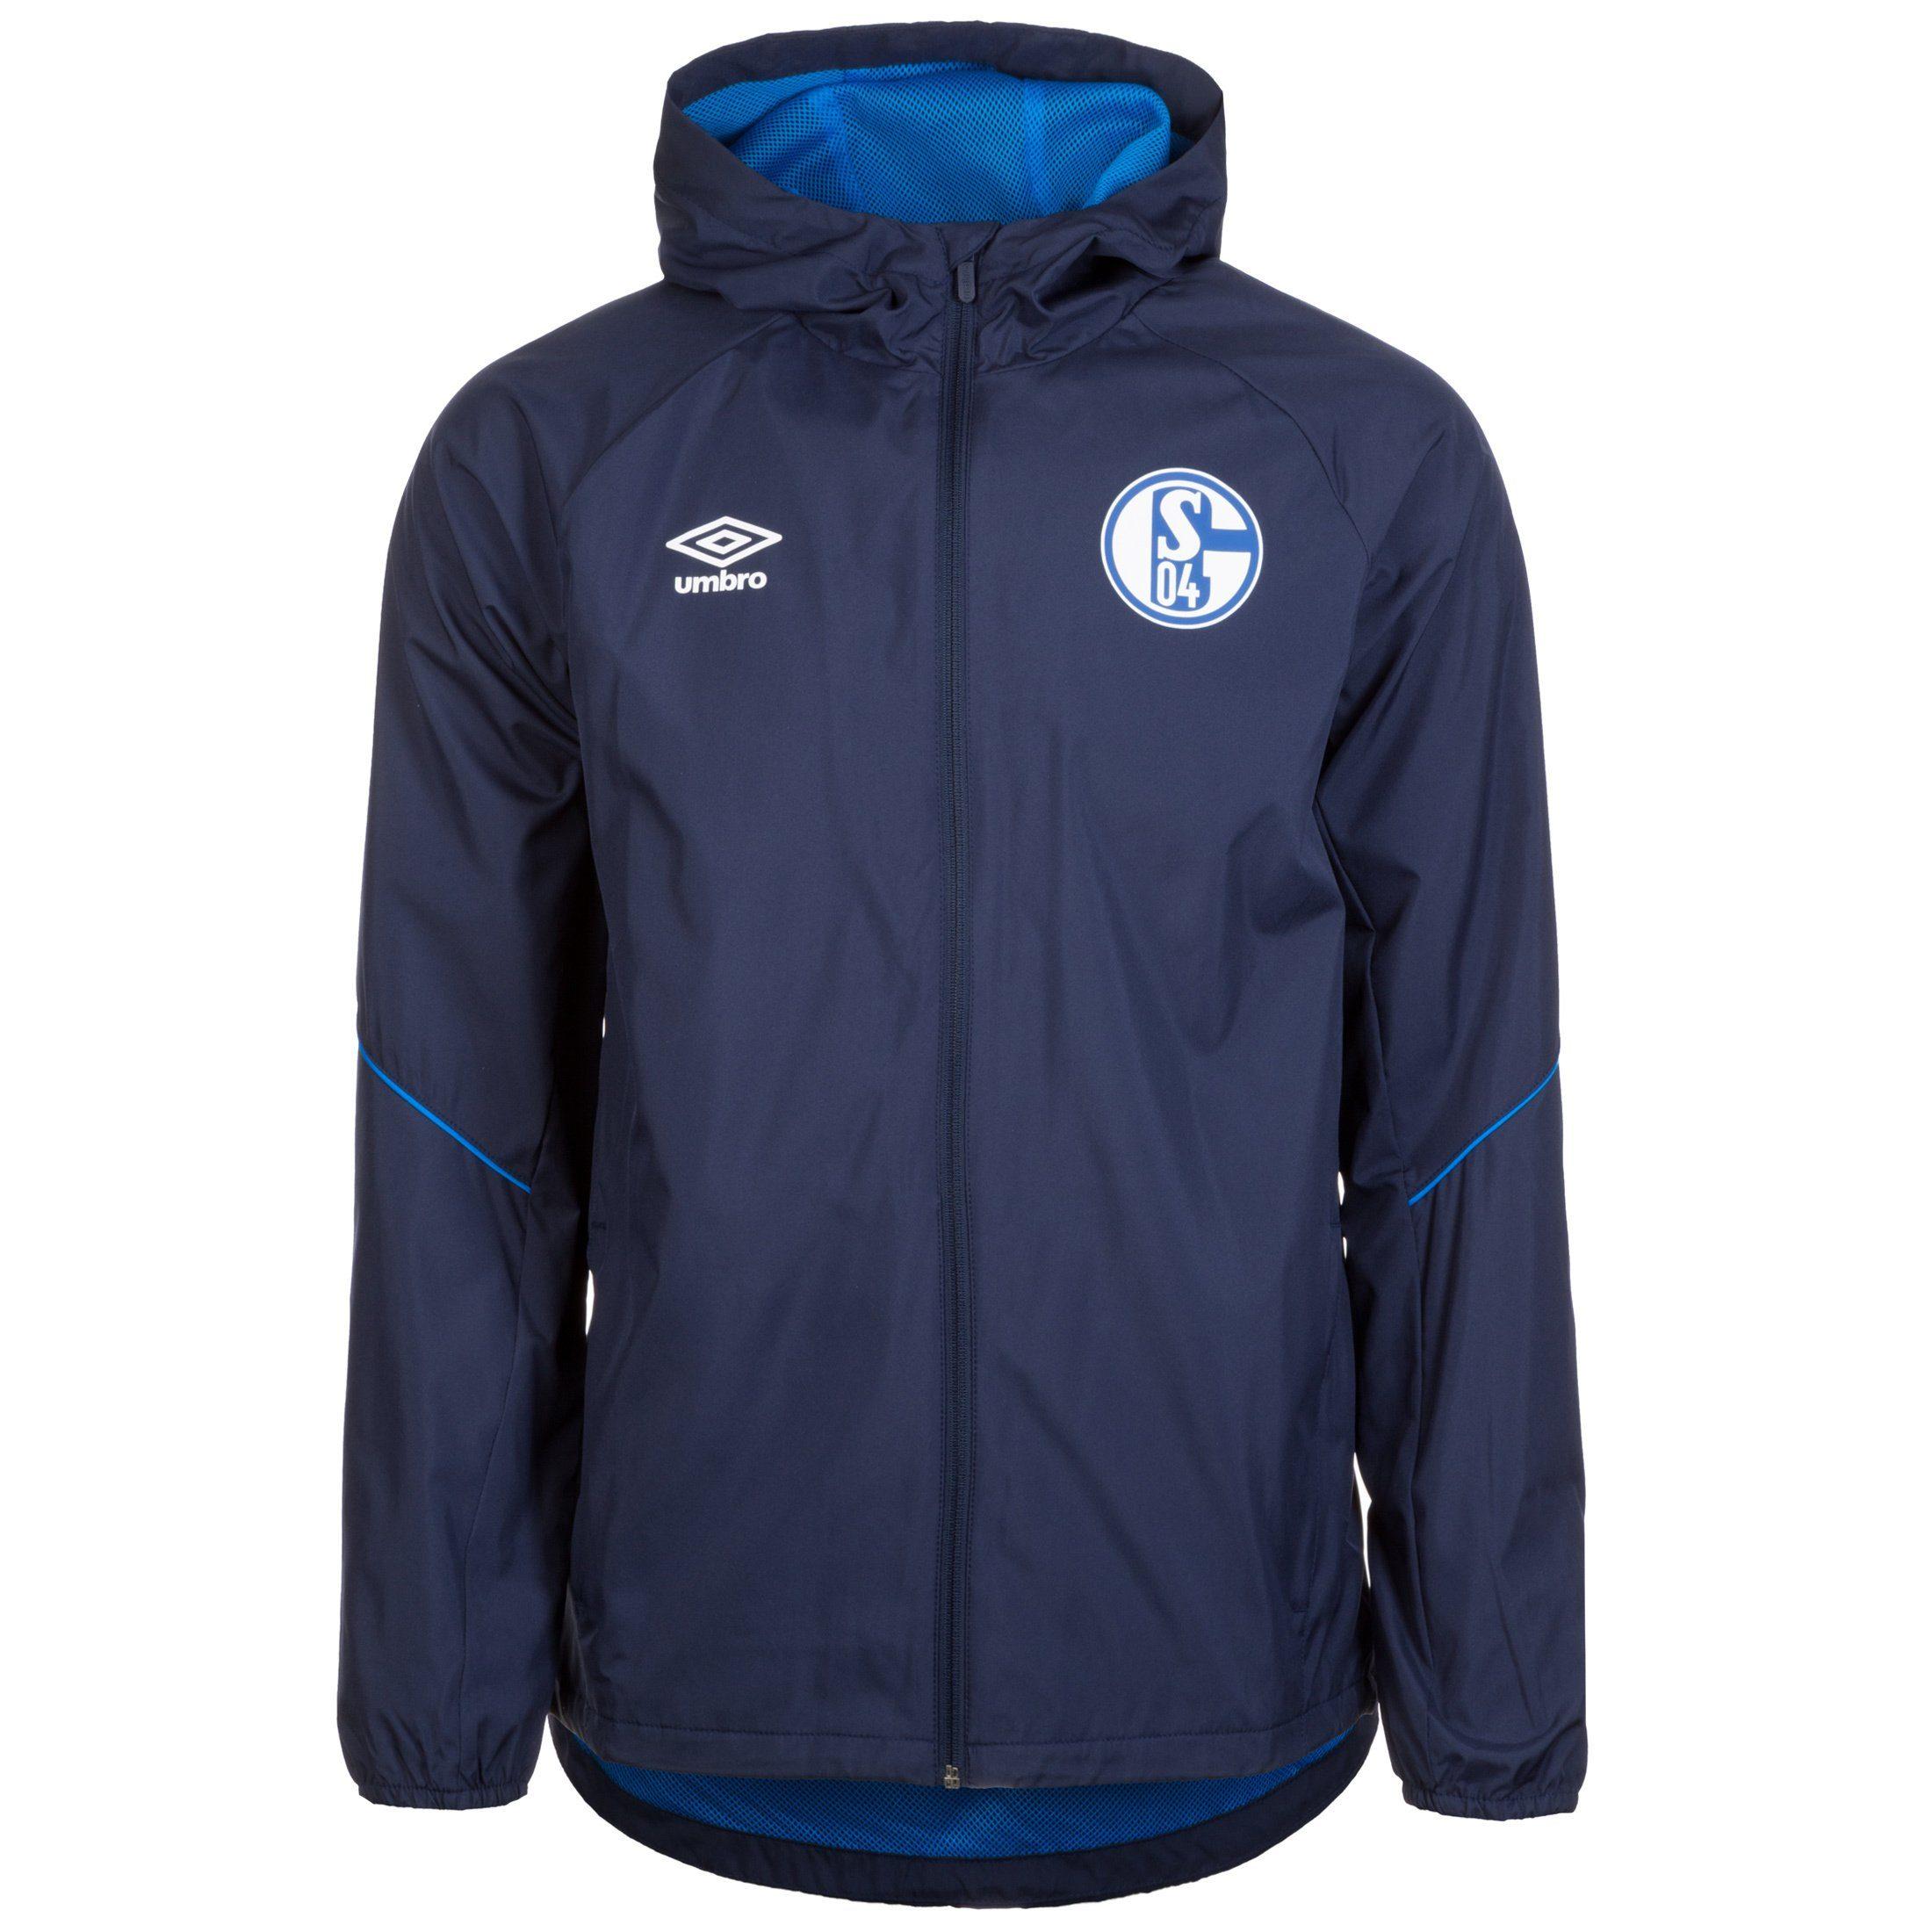 Umbro Regenjacke Fc Schalke 04   Sportbekleidung > Sportjacken > Regenjacken   Blau   Umbro